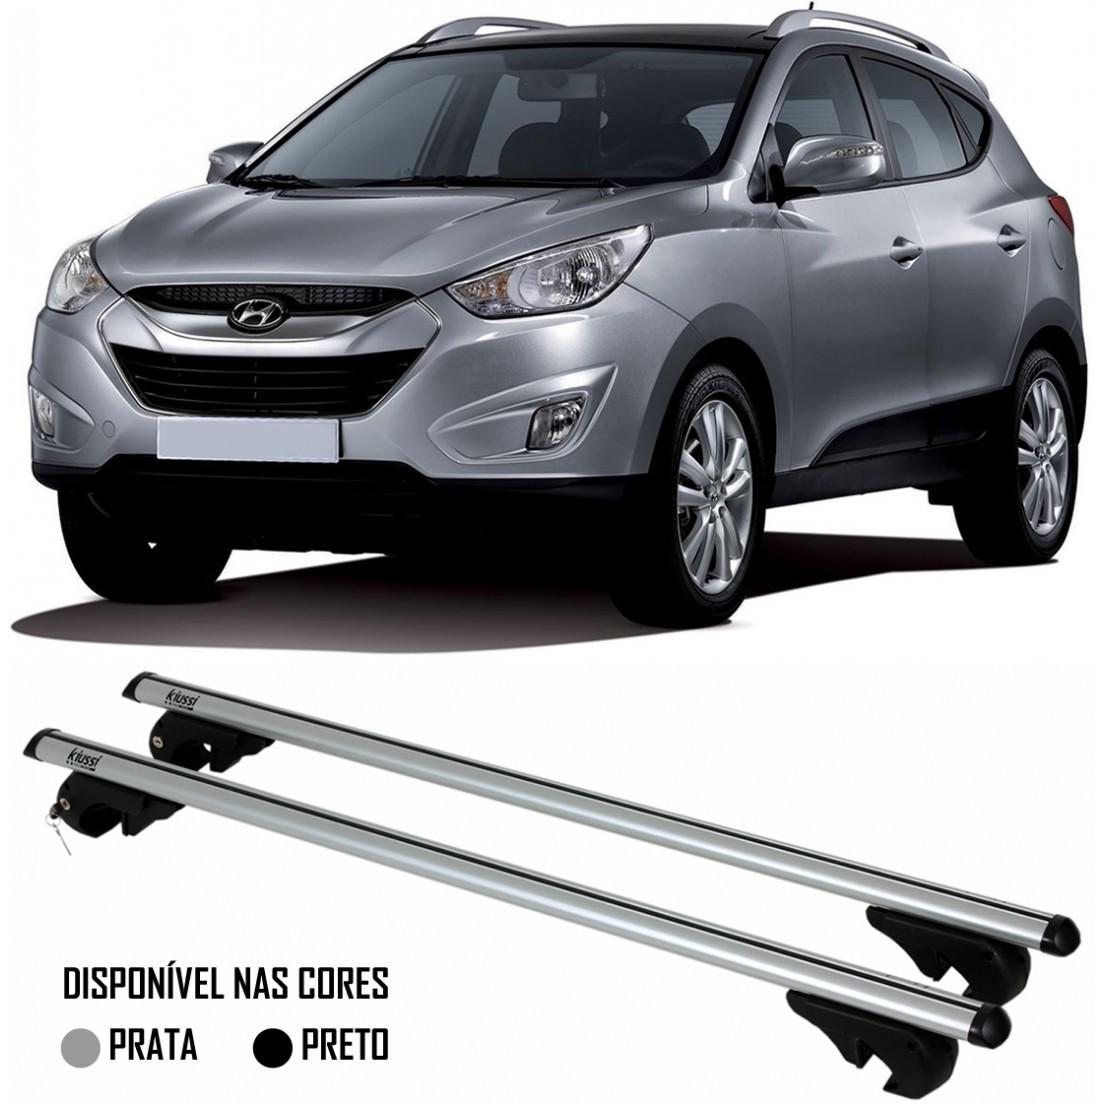 Rack Travessa Hyundai IX35 2010 2011 2012 2013 2014 2015 2016 - Kiussi Alumínio Com Chave 50KG - Preto / Prata